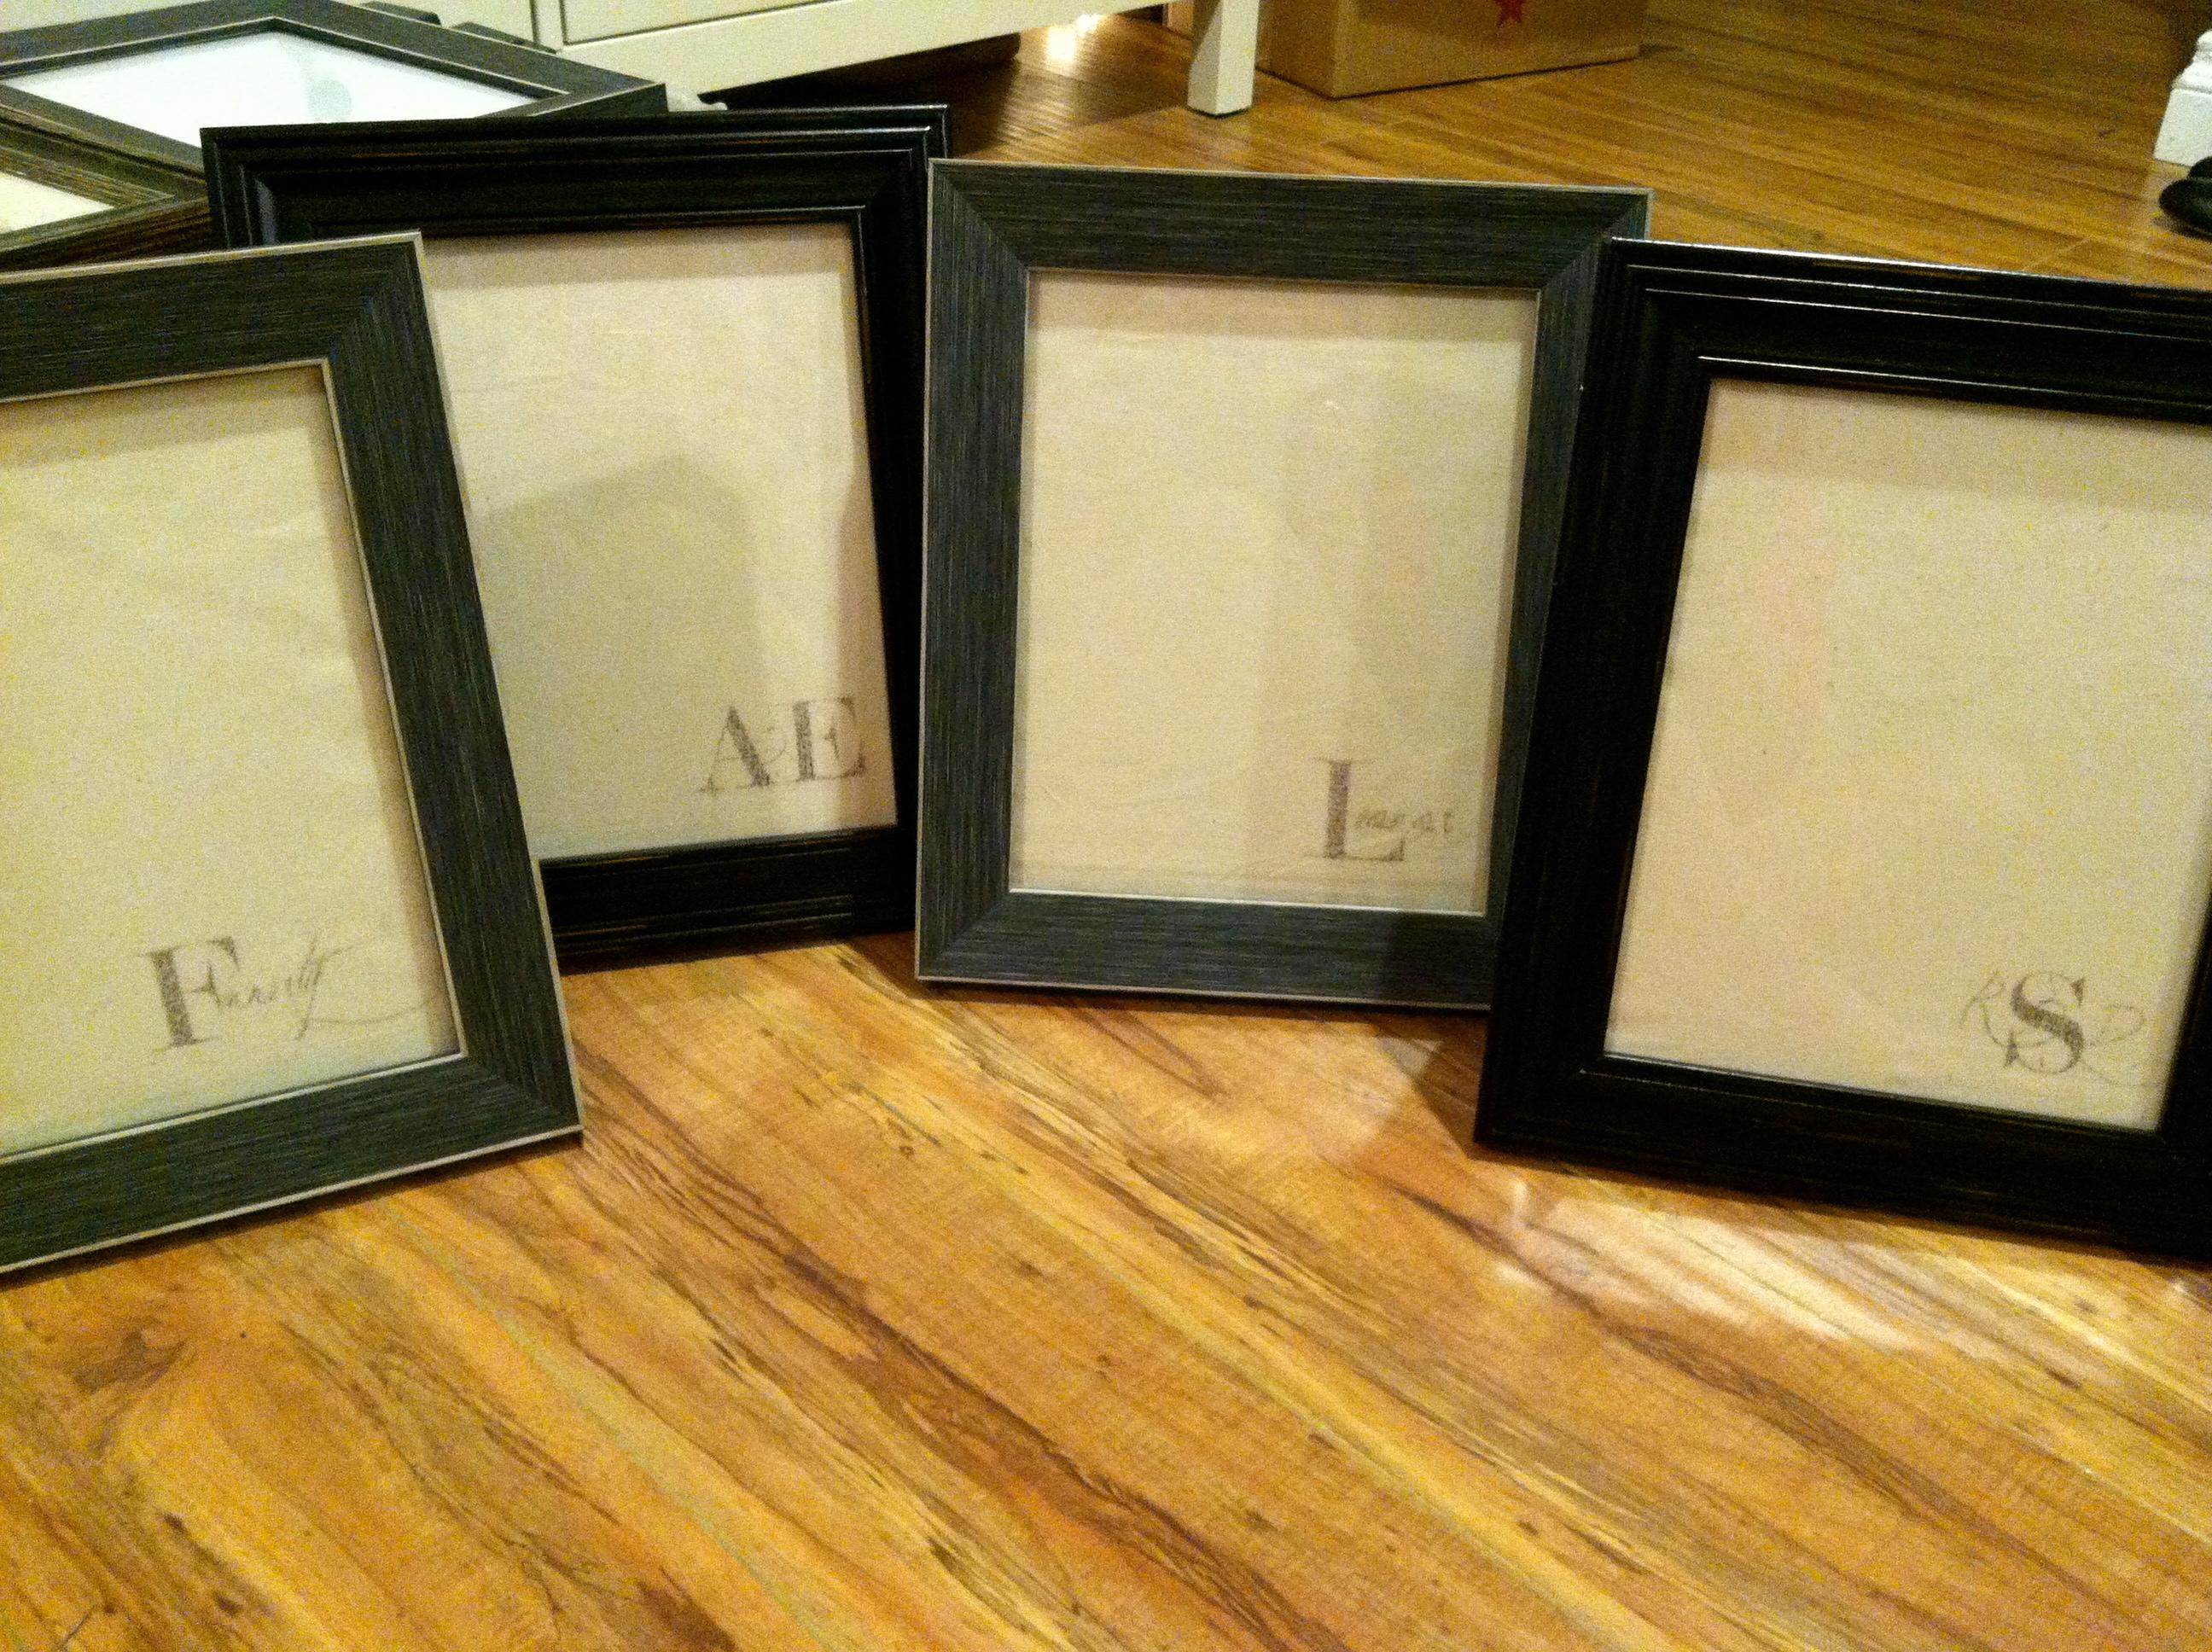 Dry-erase frames.